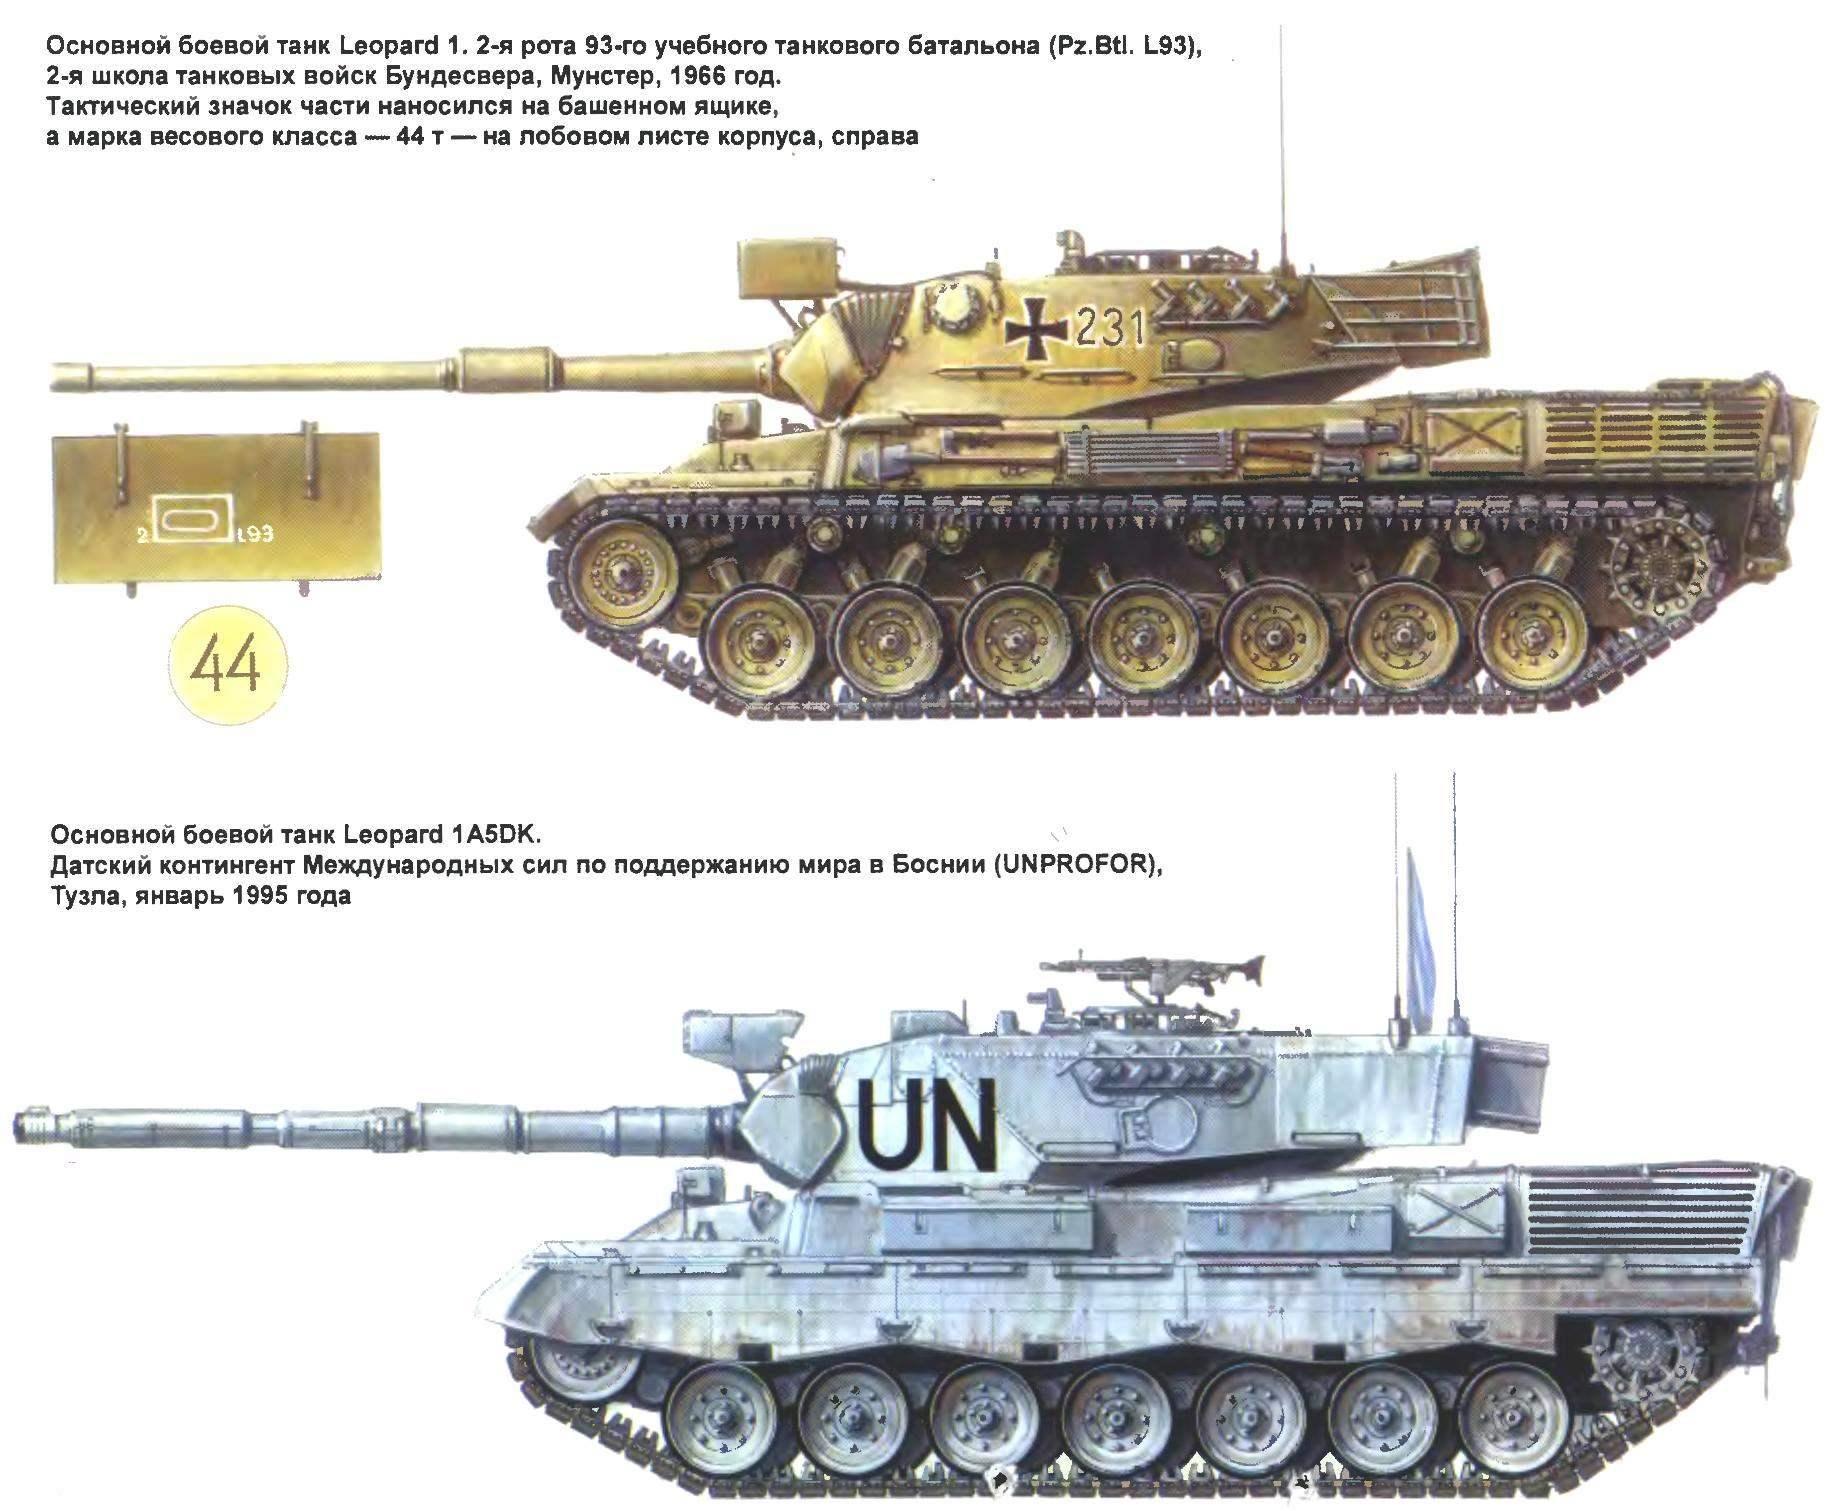 NATO STANDARD TANK